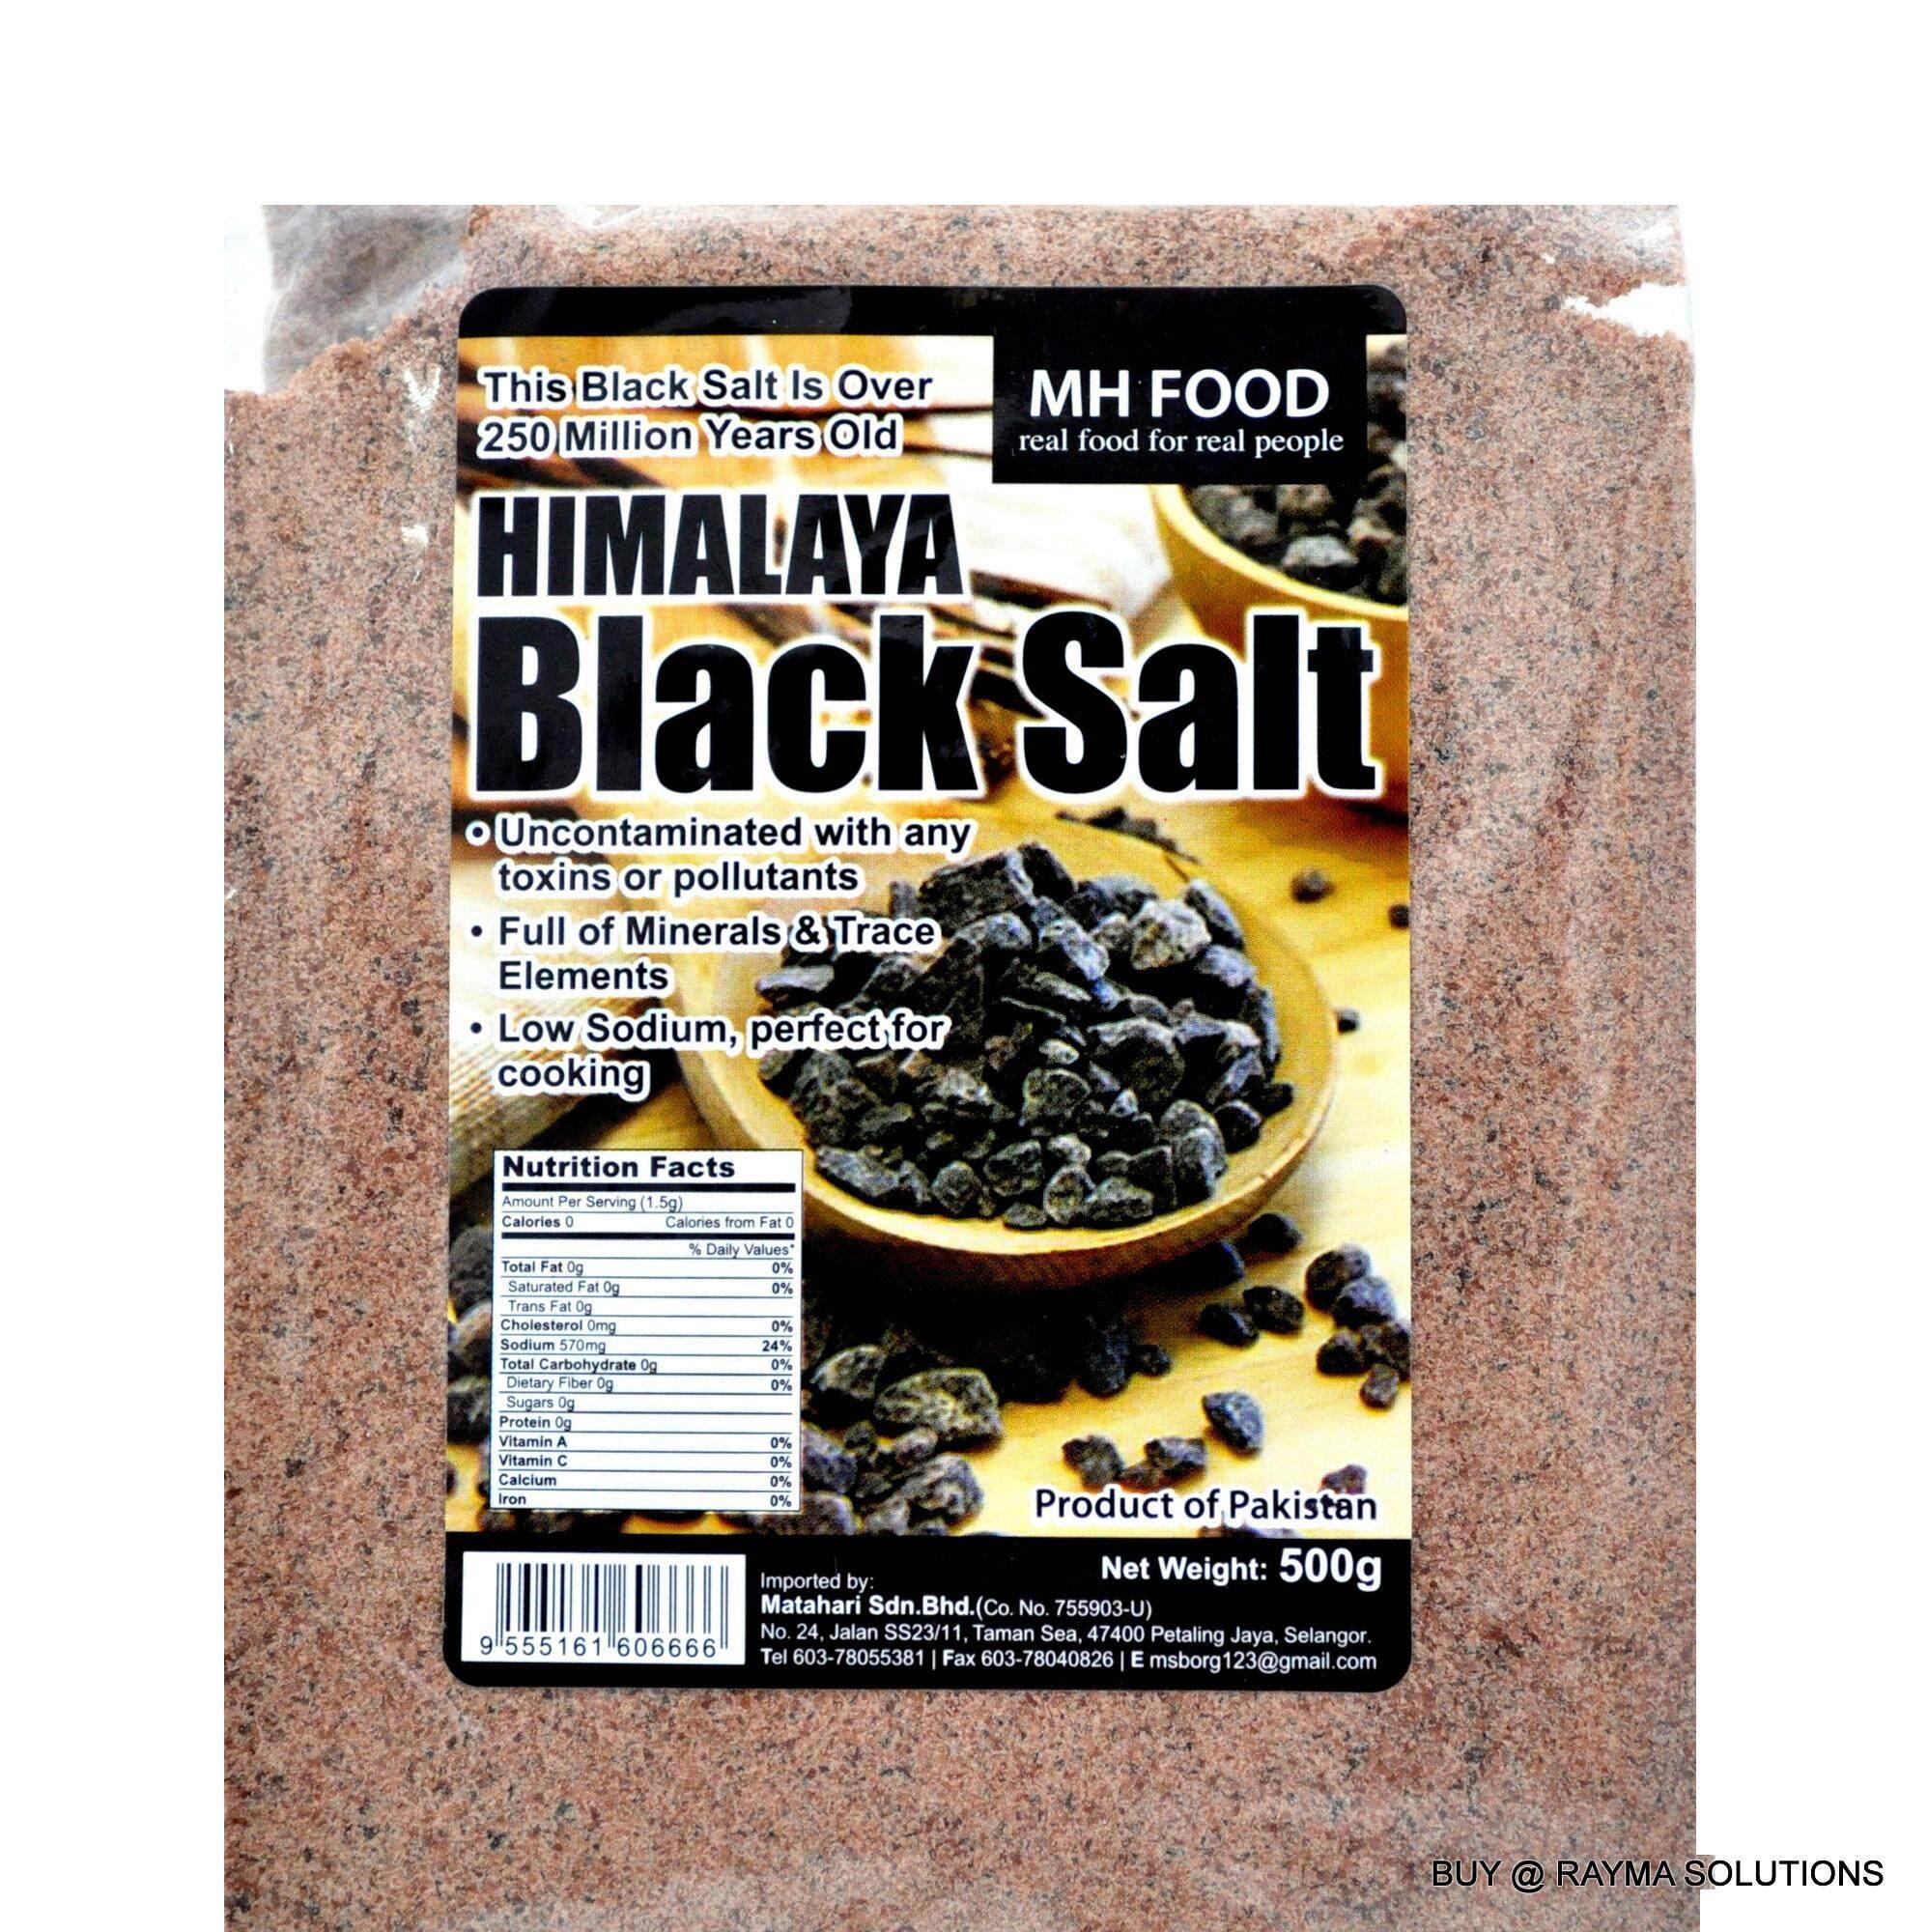 [BEST DEAL] MH FOOD Premium Himalaya Black Salt - Fine 500g (6 Packs)